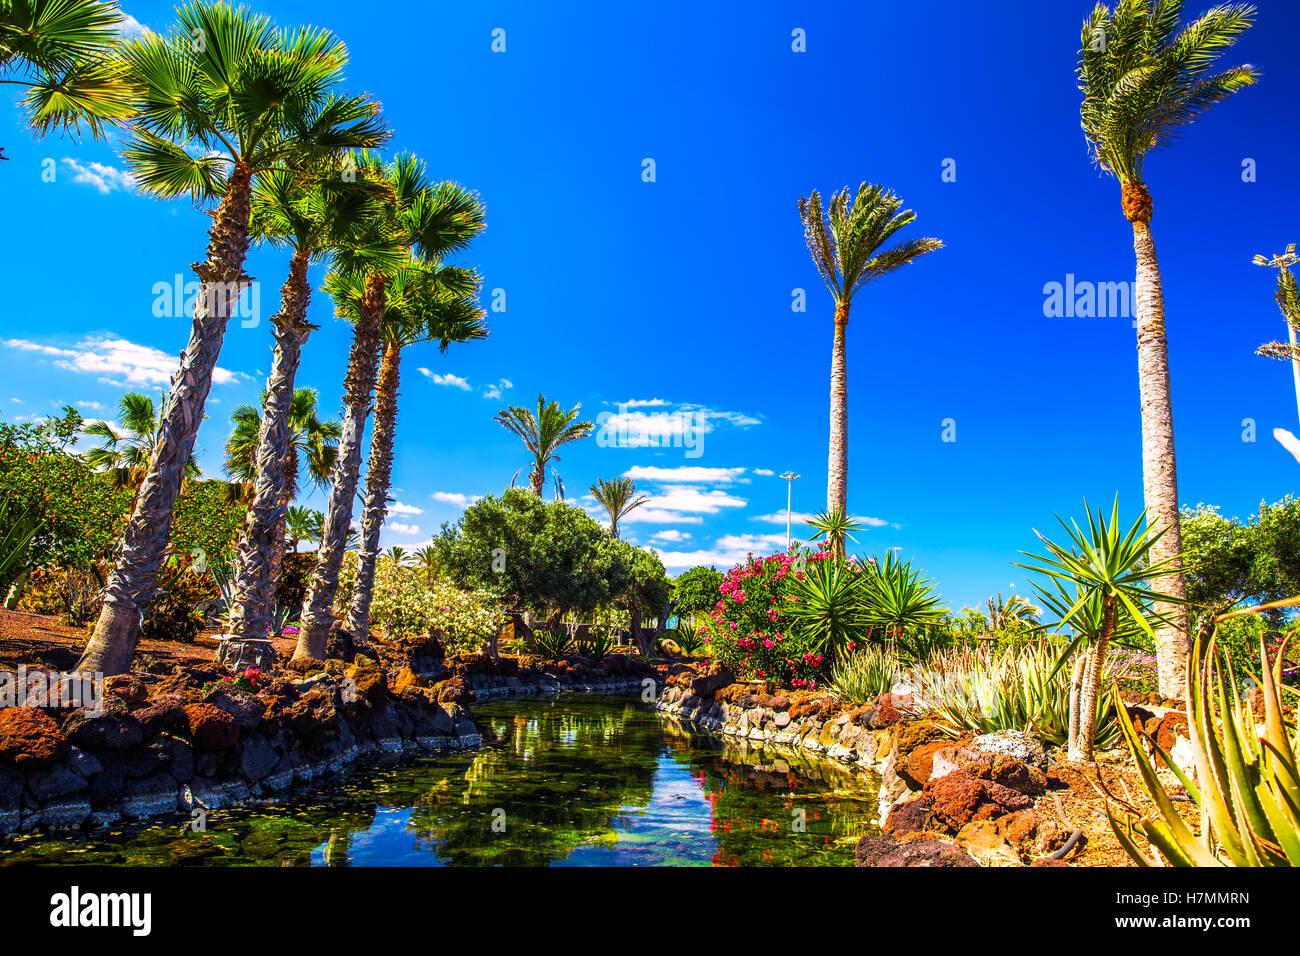 1366x768 beautiful tropical island - photo #36